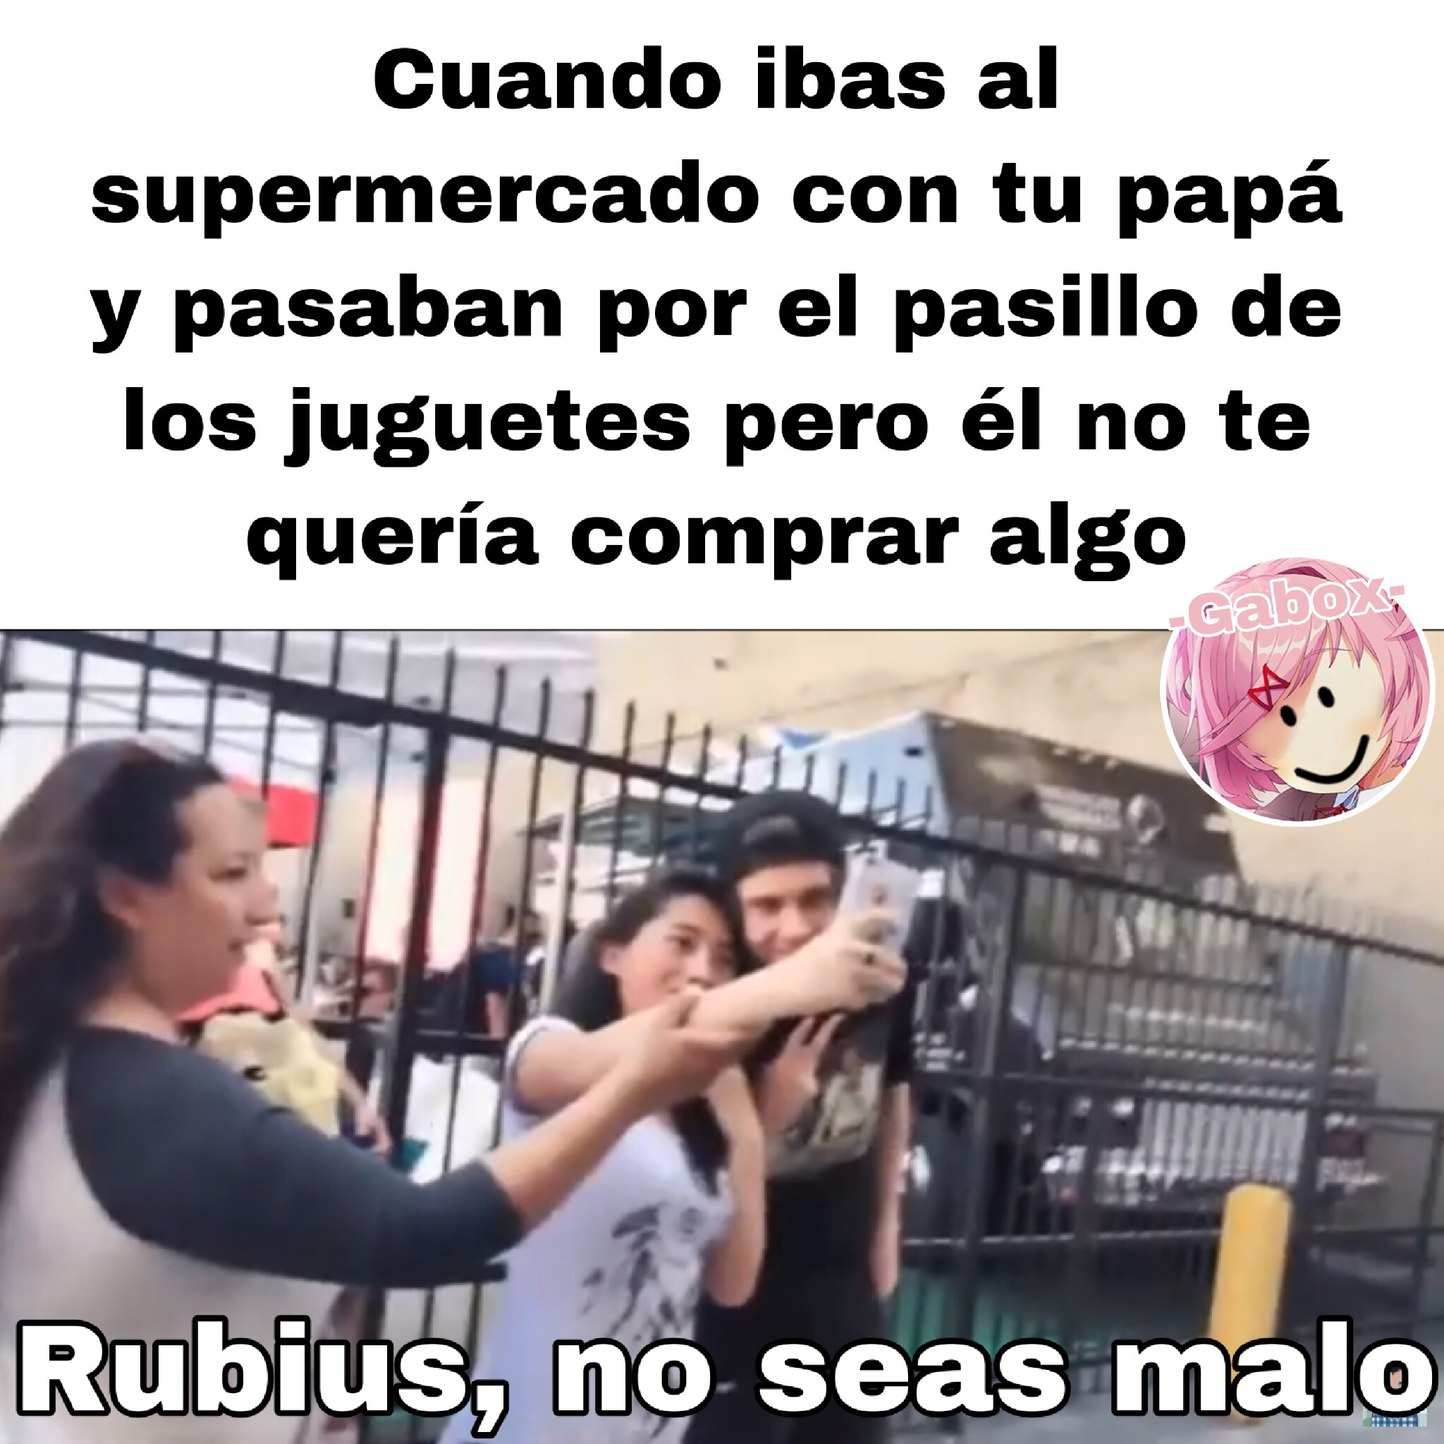 RuBiUs, No SeAs MaLo. - meme